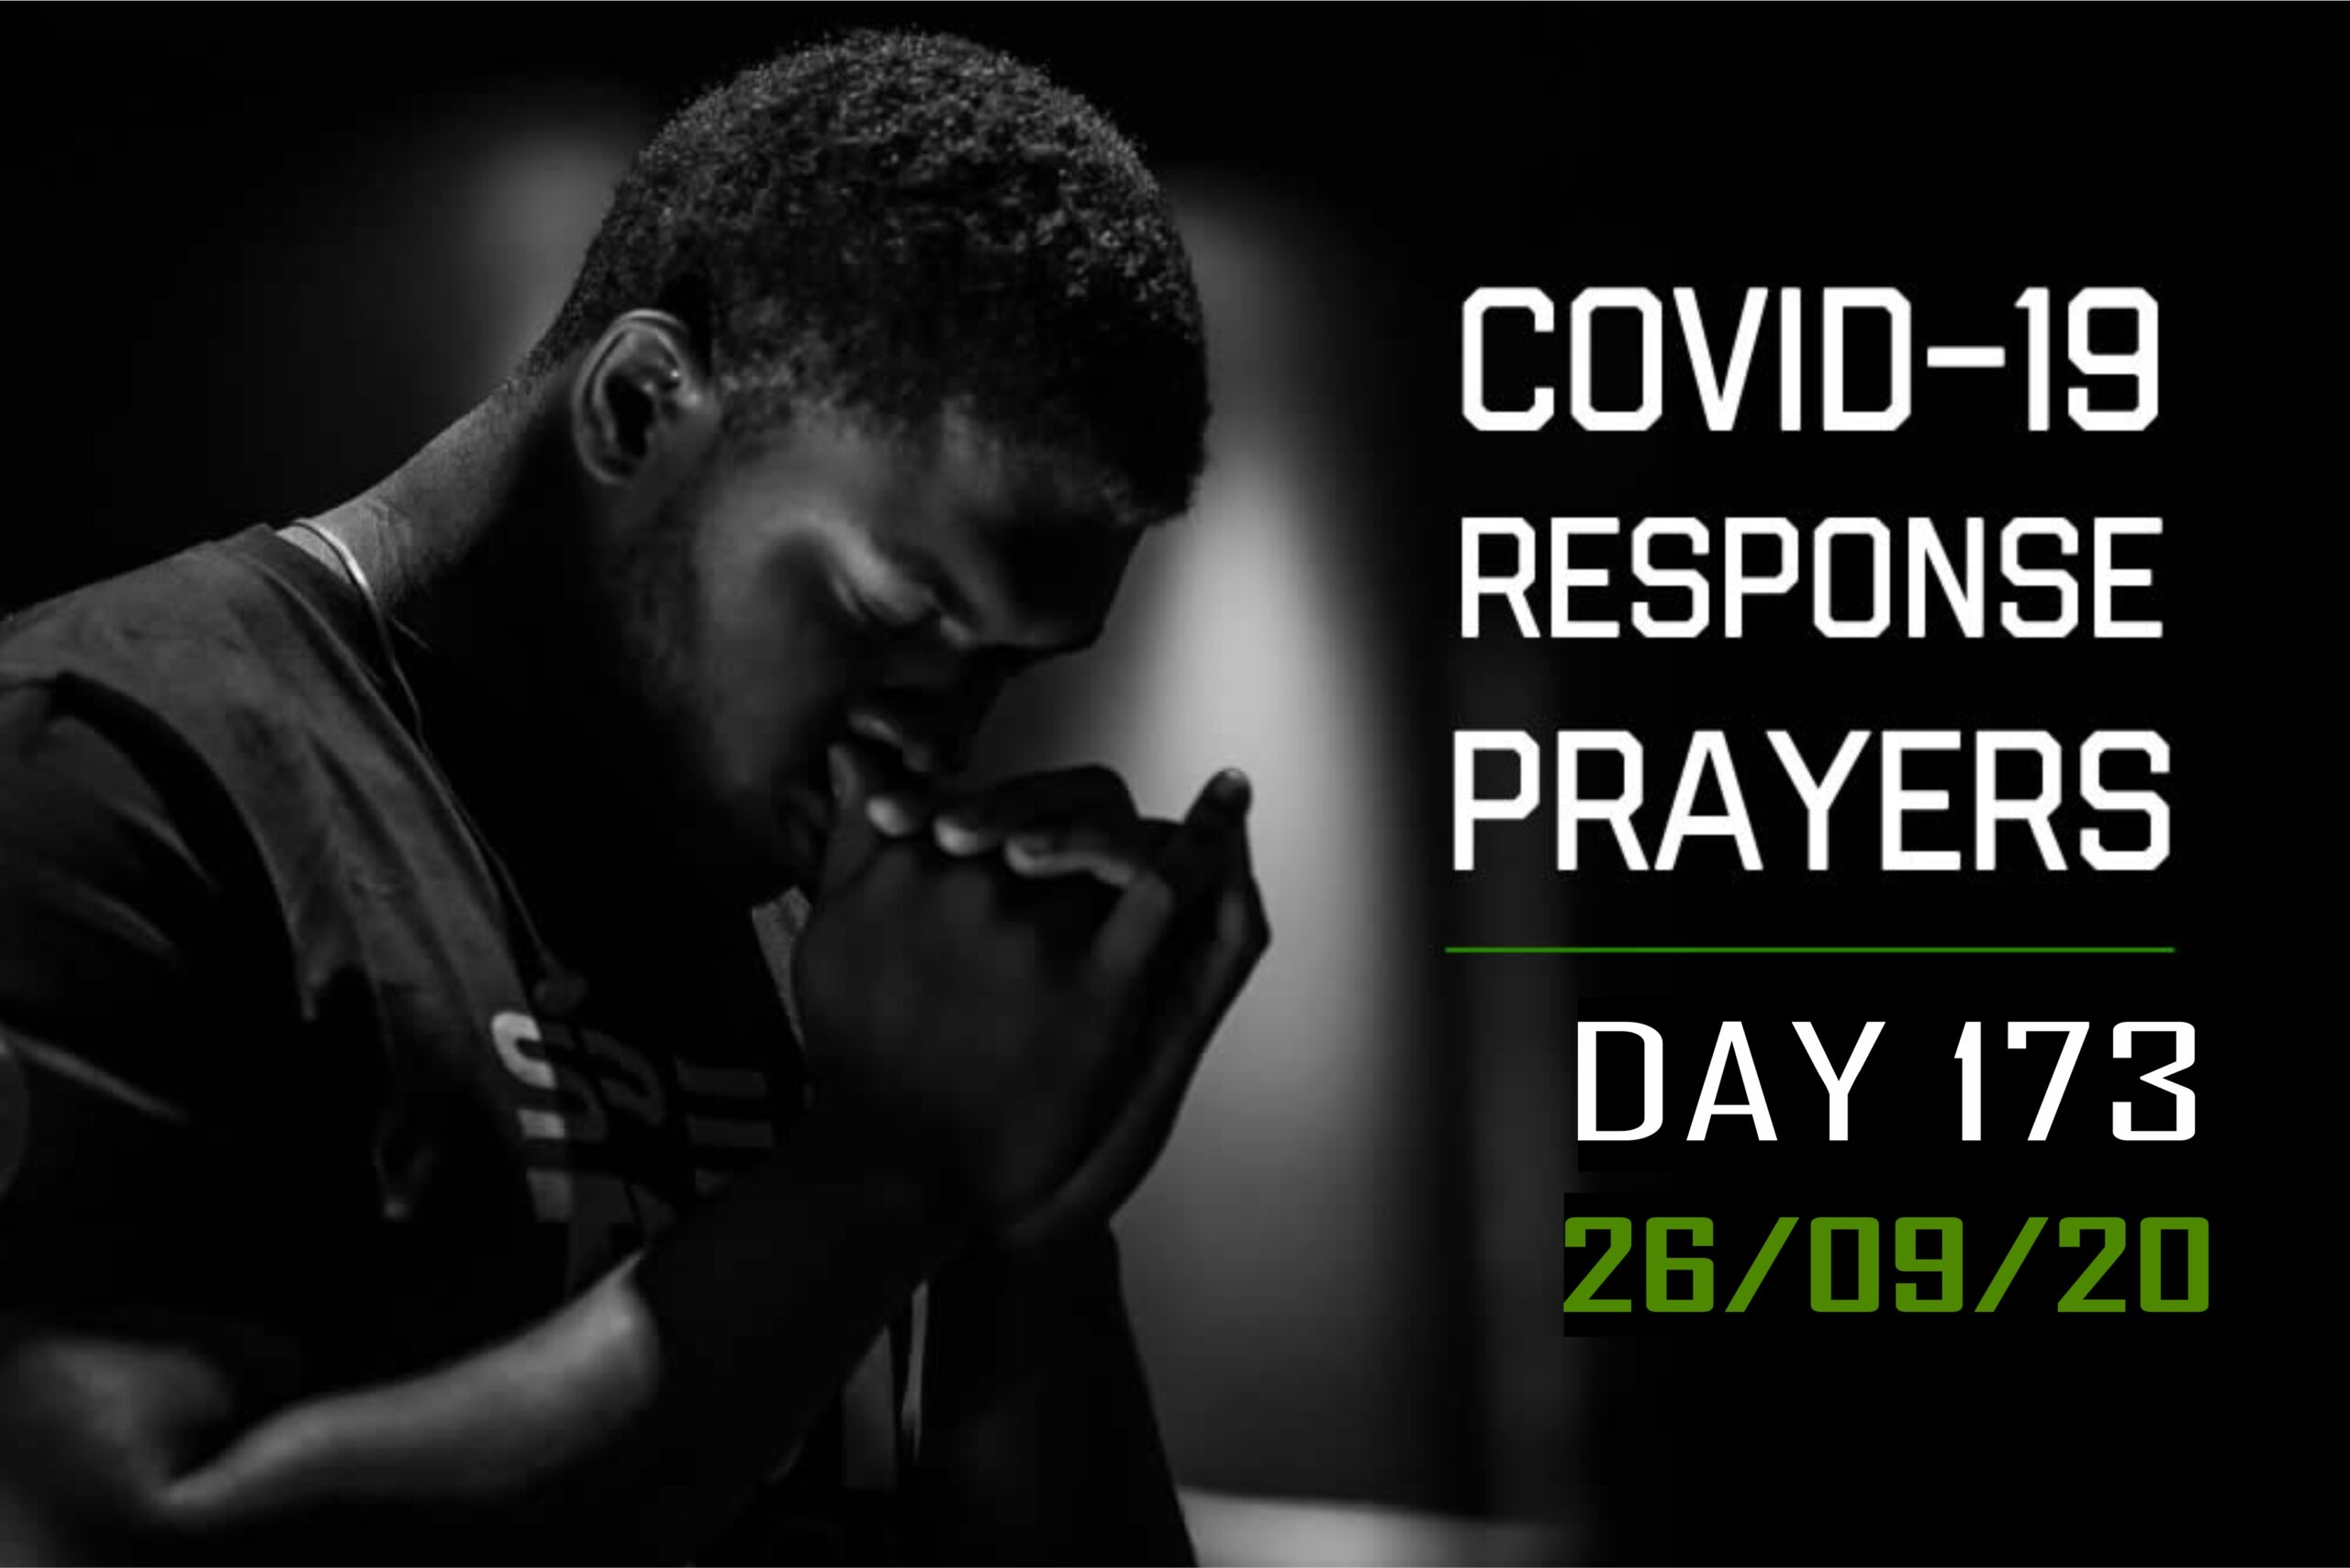 COVID-19 Response Prayers Day – 173